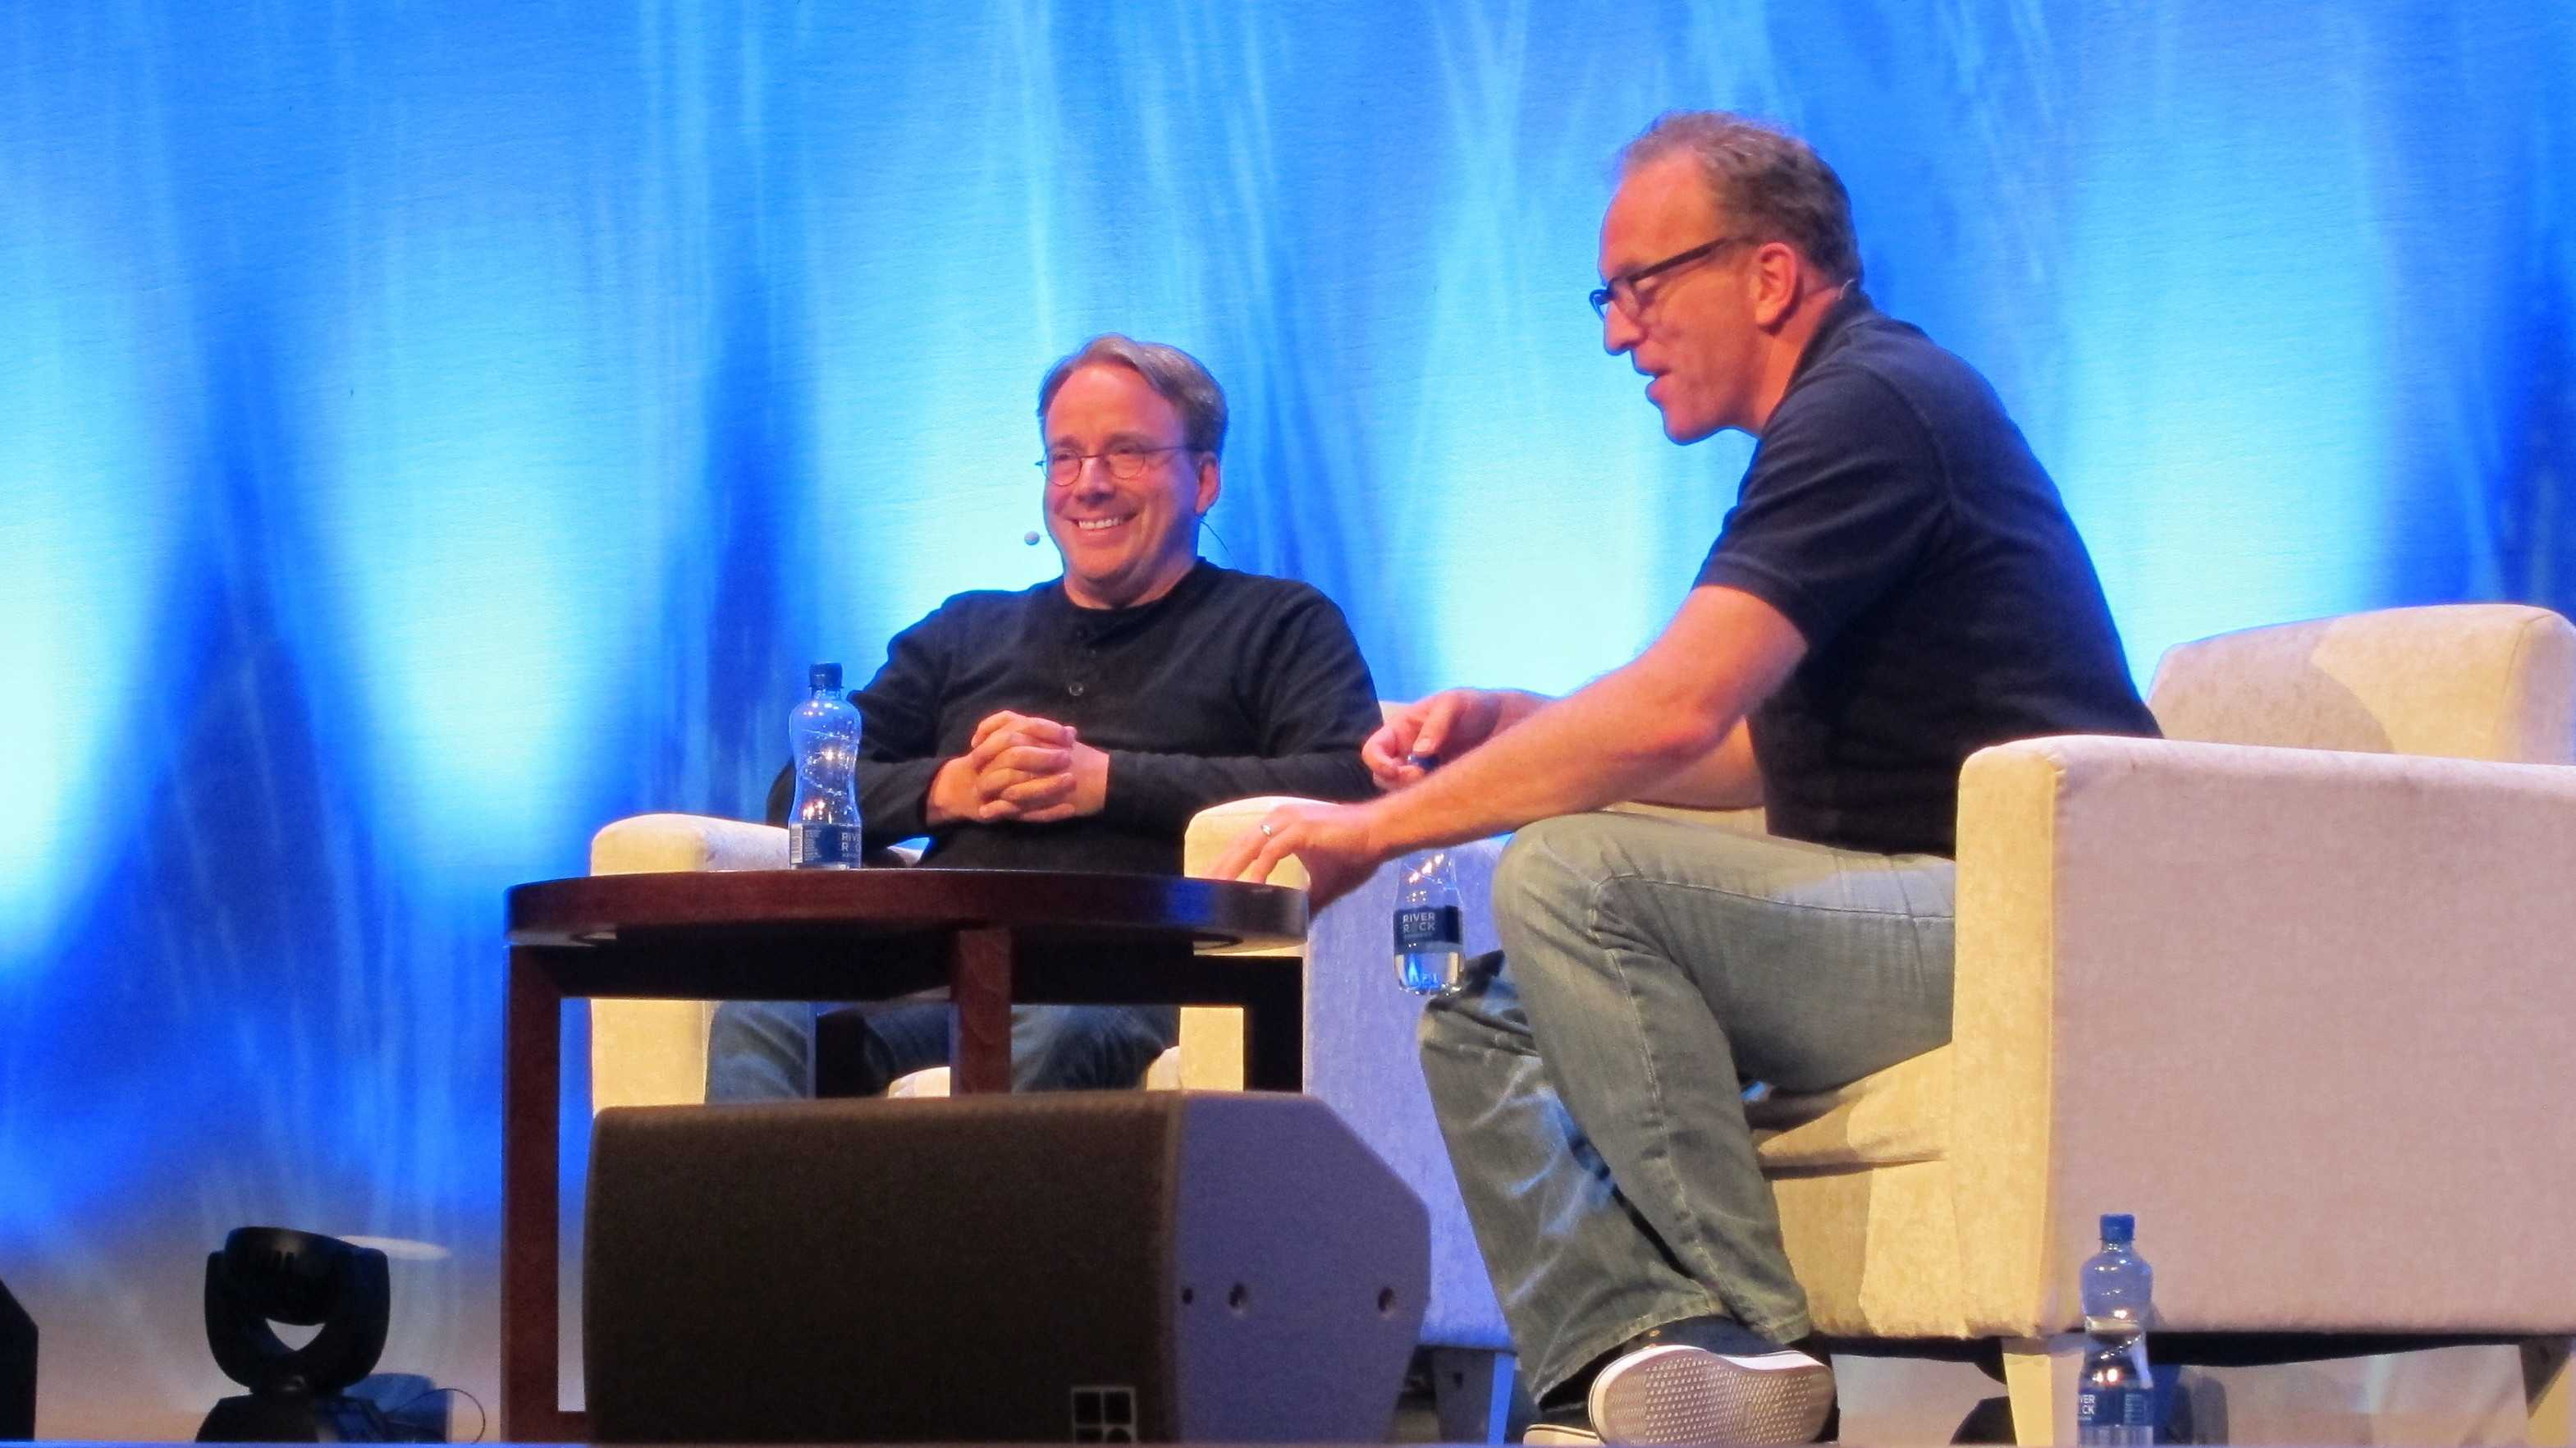 Linus Torvalds, Dirk Hohndel